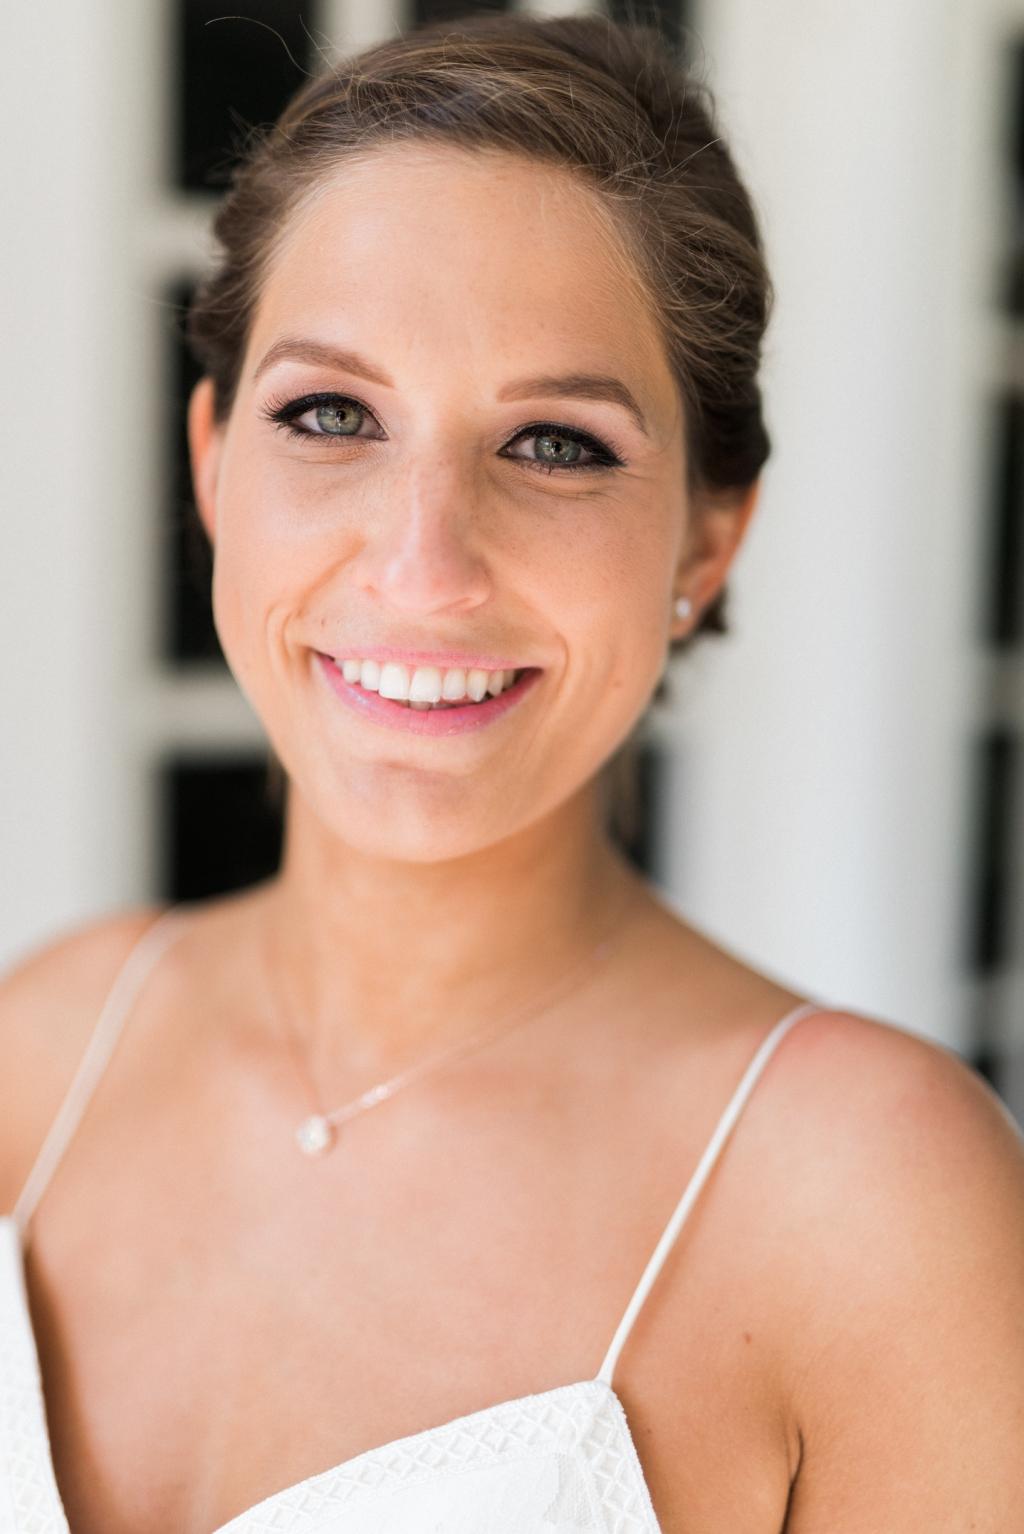 haley-richter-photography-buena-vista-confrence-center-wedding-summer-087